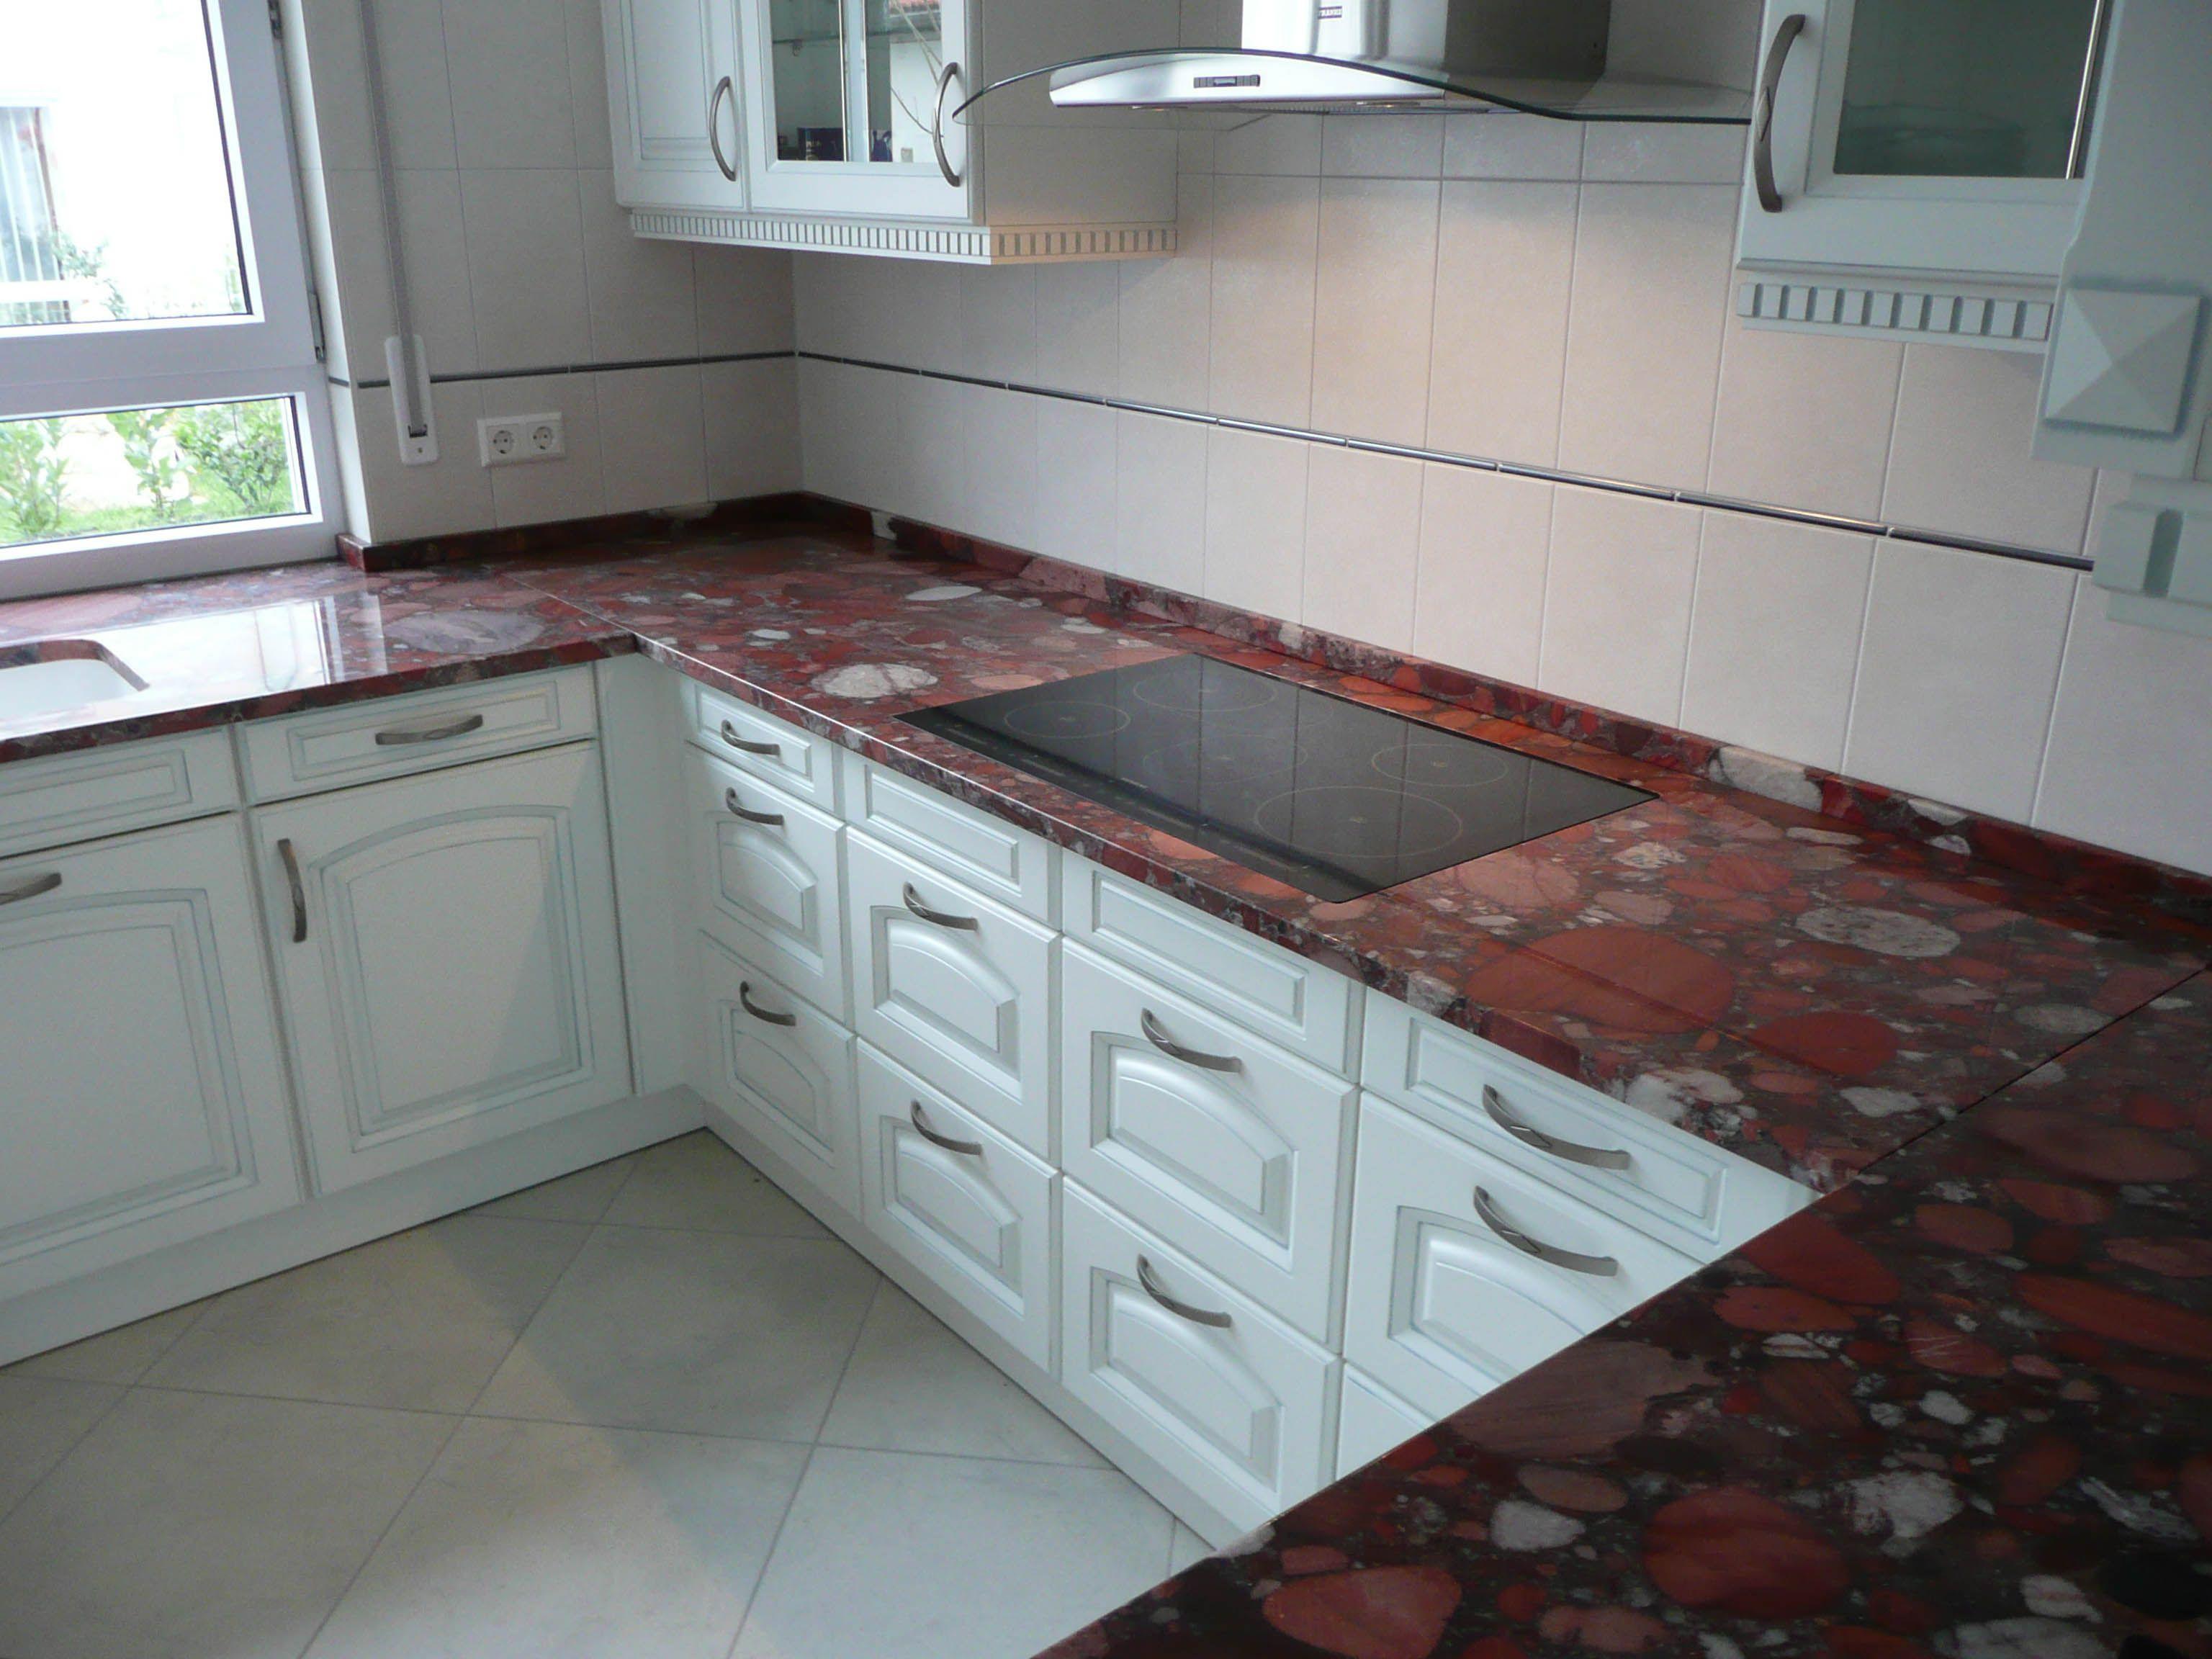 Marinace Rosso Granit Http Www Granit Arbeitsplatten Com Marinace Rosso Granit Arbeitsplatten Marinace Rosso Kitchen Kitchen Cabinets Home Decor